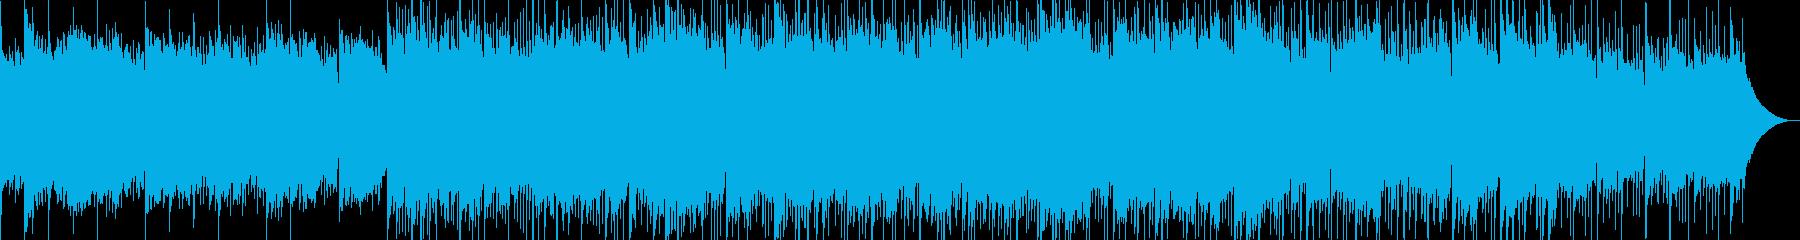 Acoustic Corporateの再生済みの波形